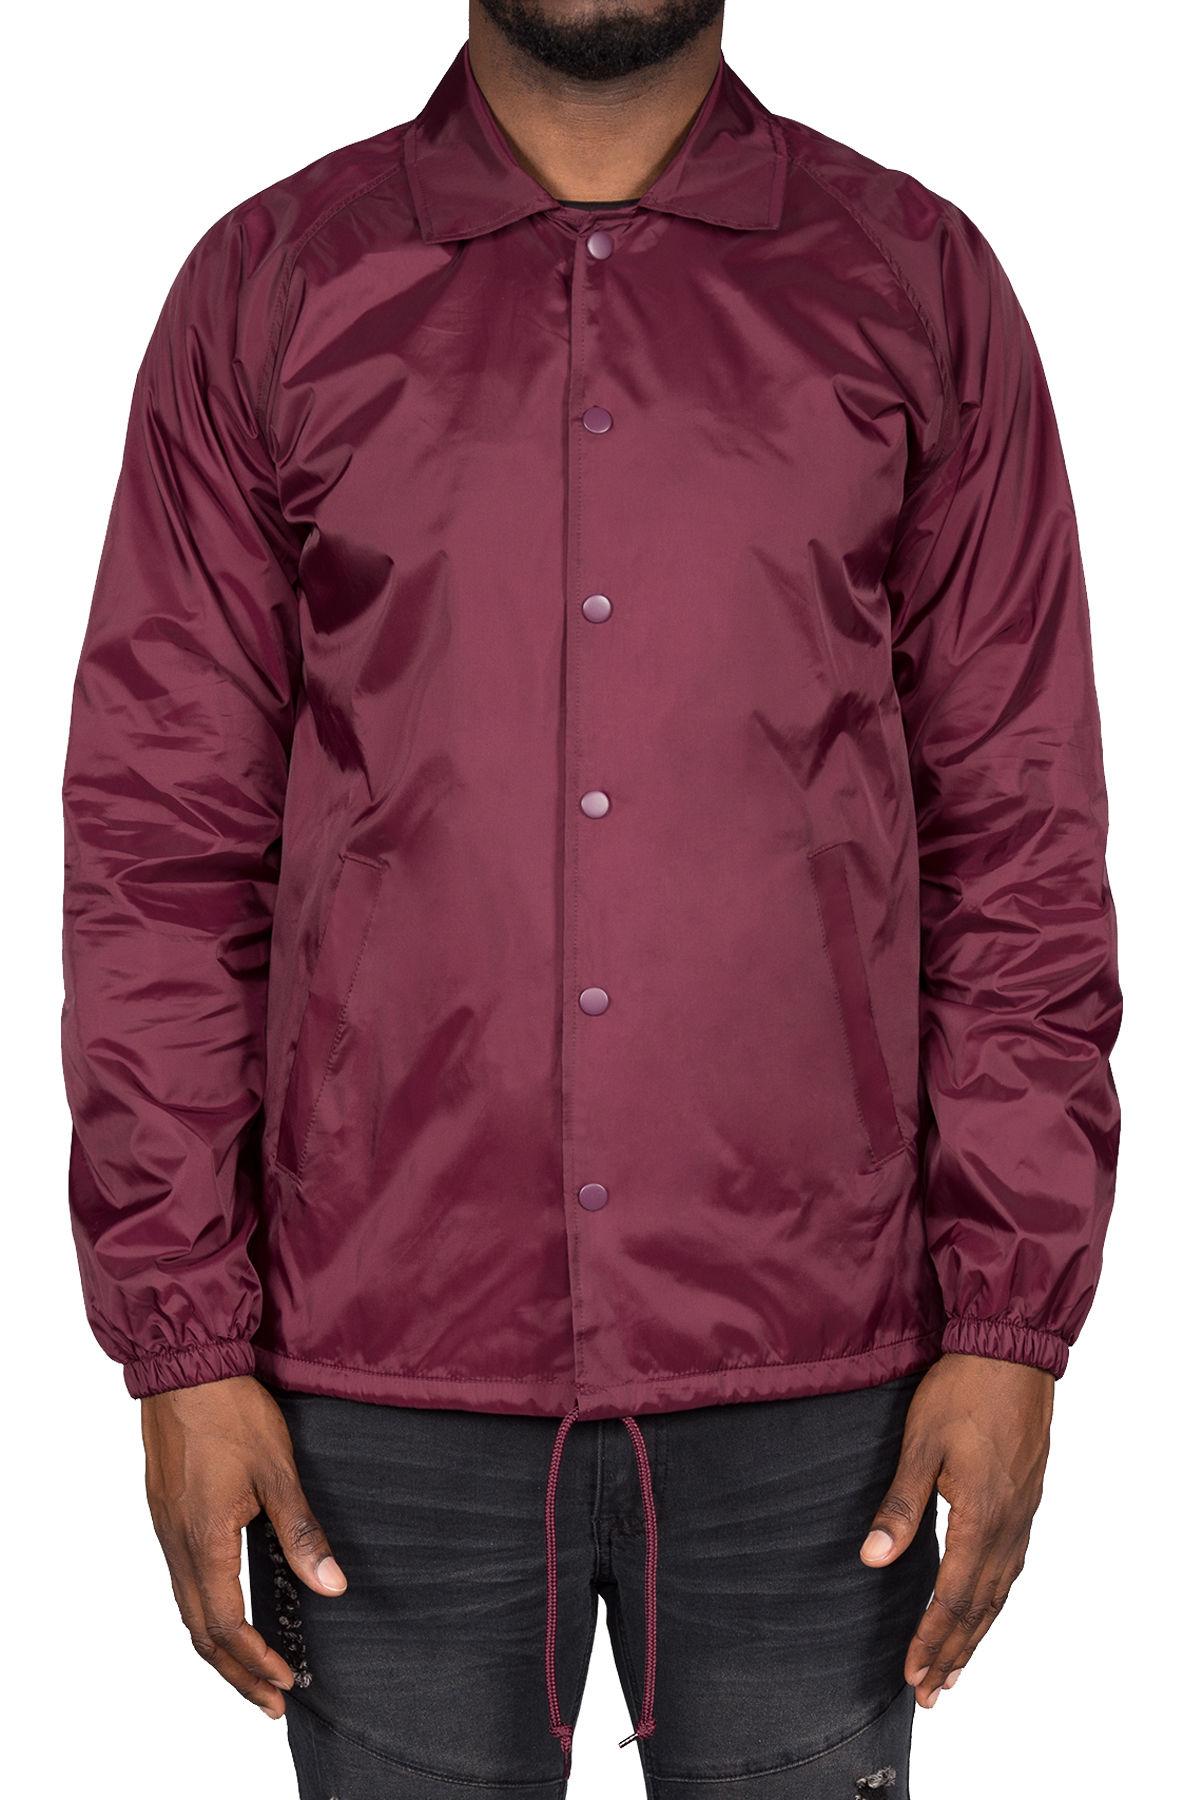 Image of Phil Coaches Jacket (Maroon)